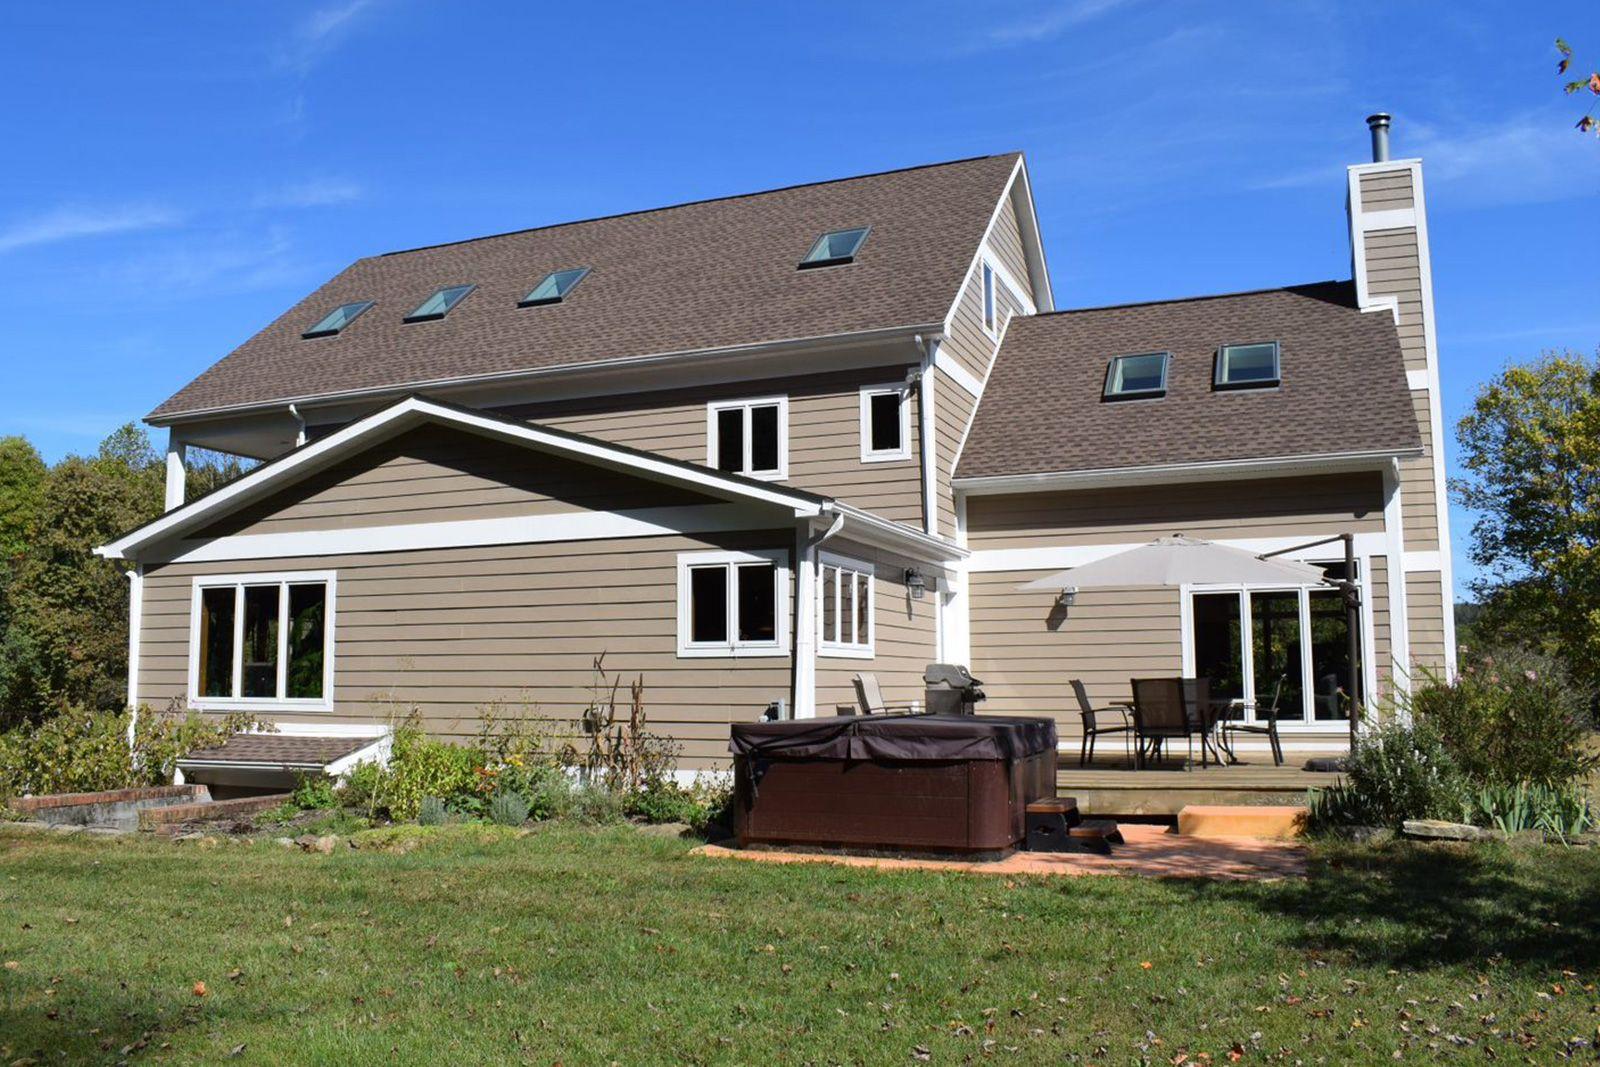 Property Development case study